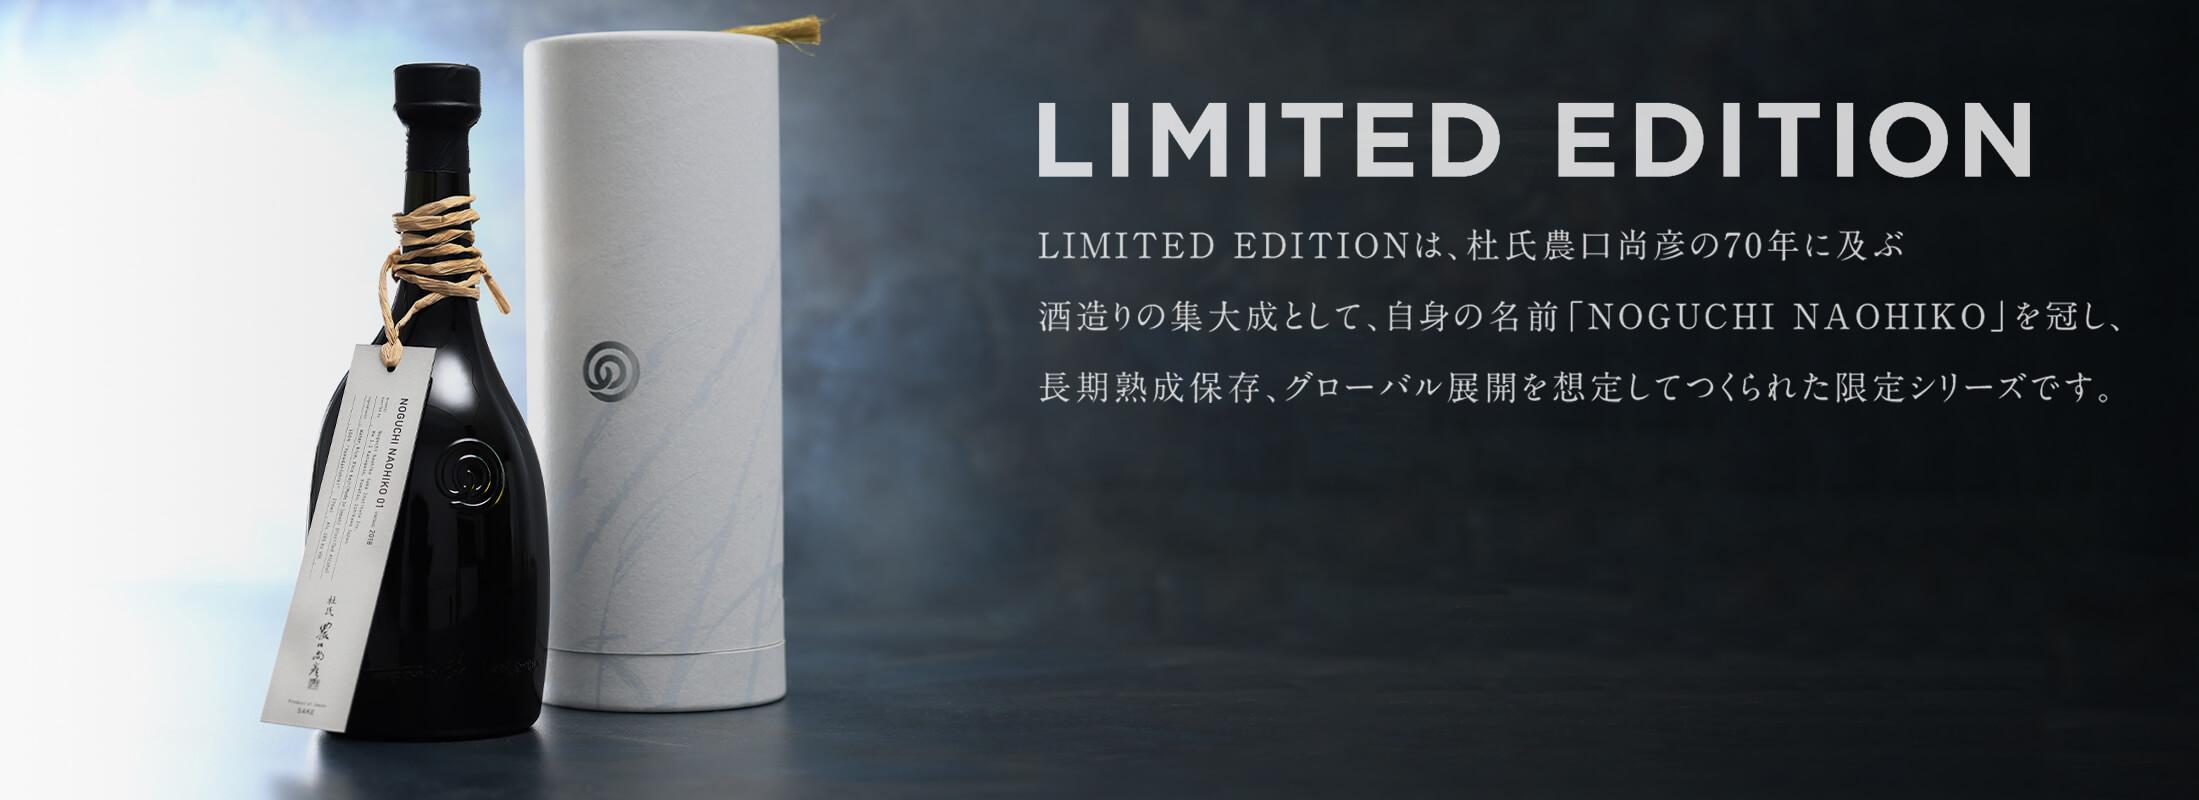 LimitedEdition NOGUCHINAOHIKO 01